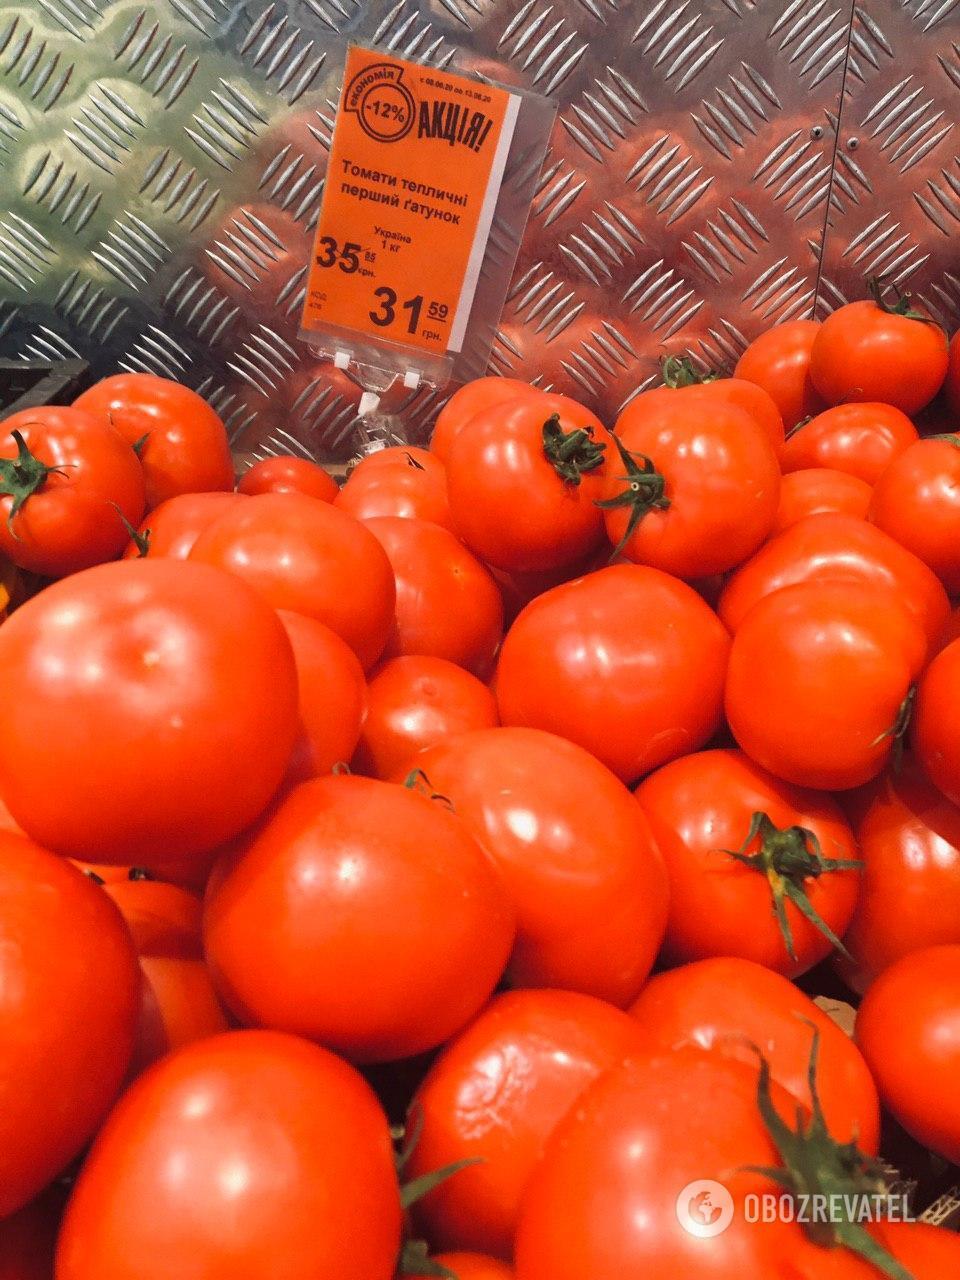 Минимальная цена на томаты в супермаркетах Днепра